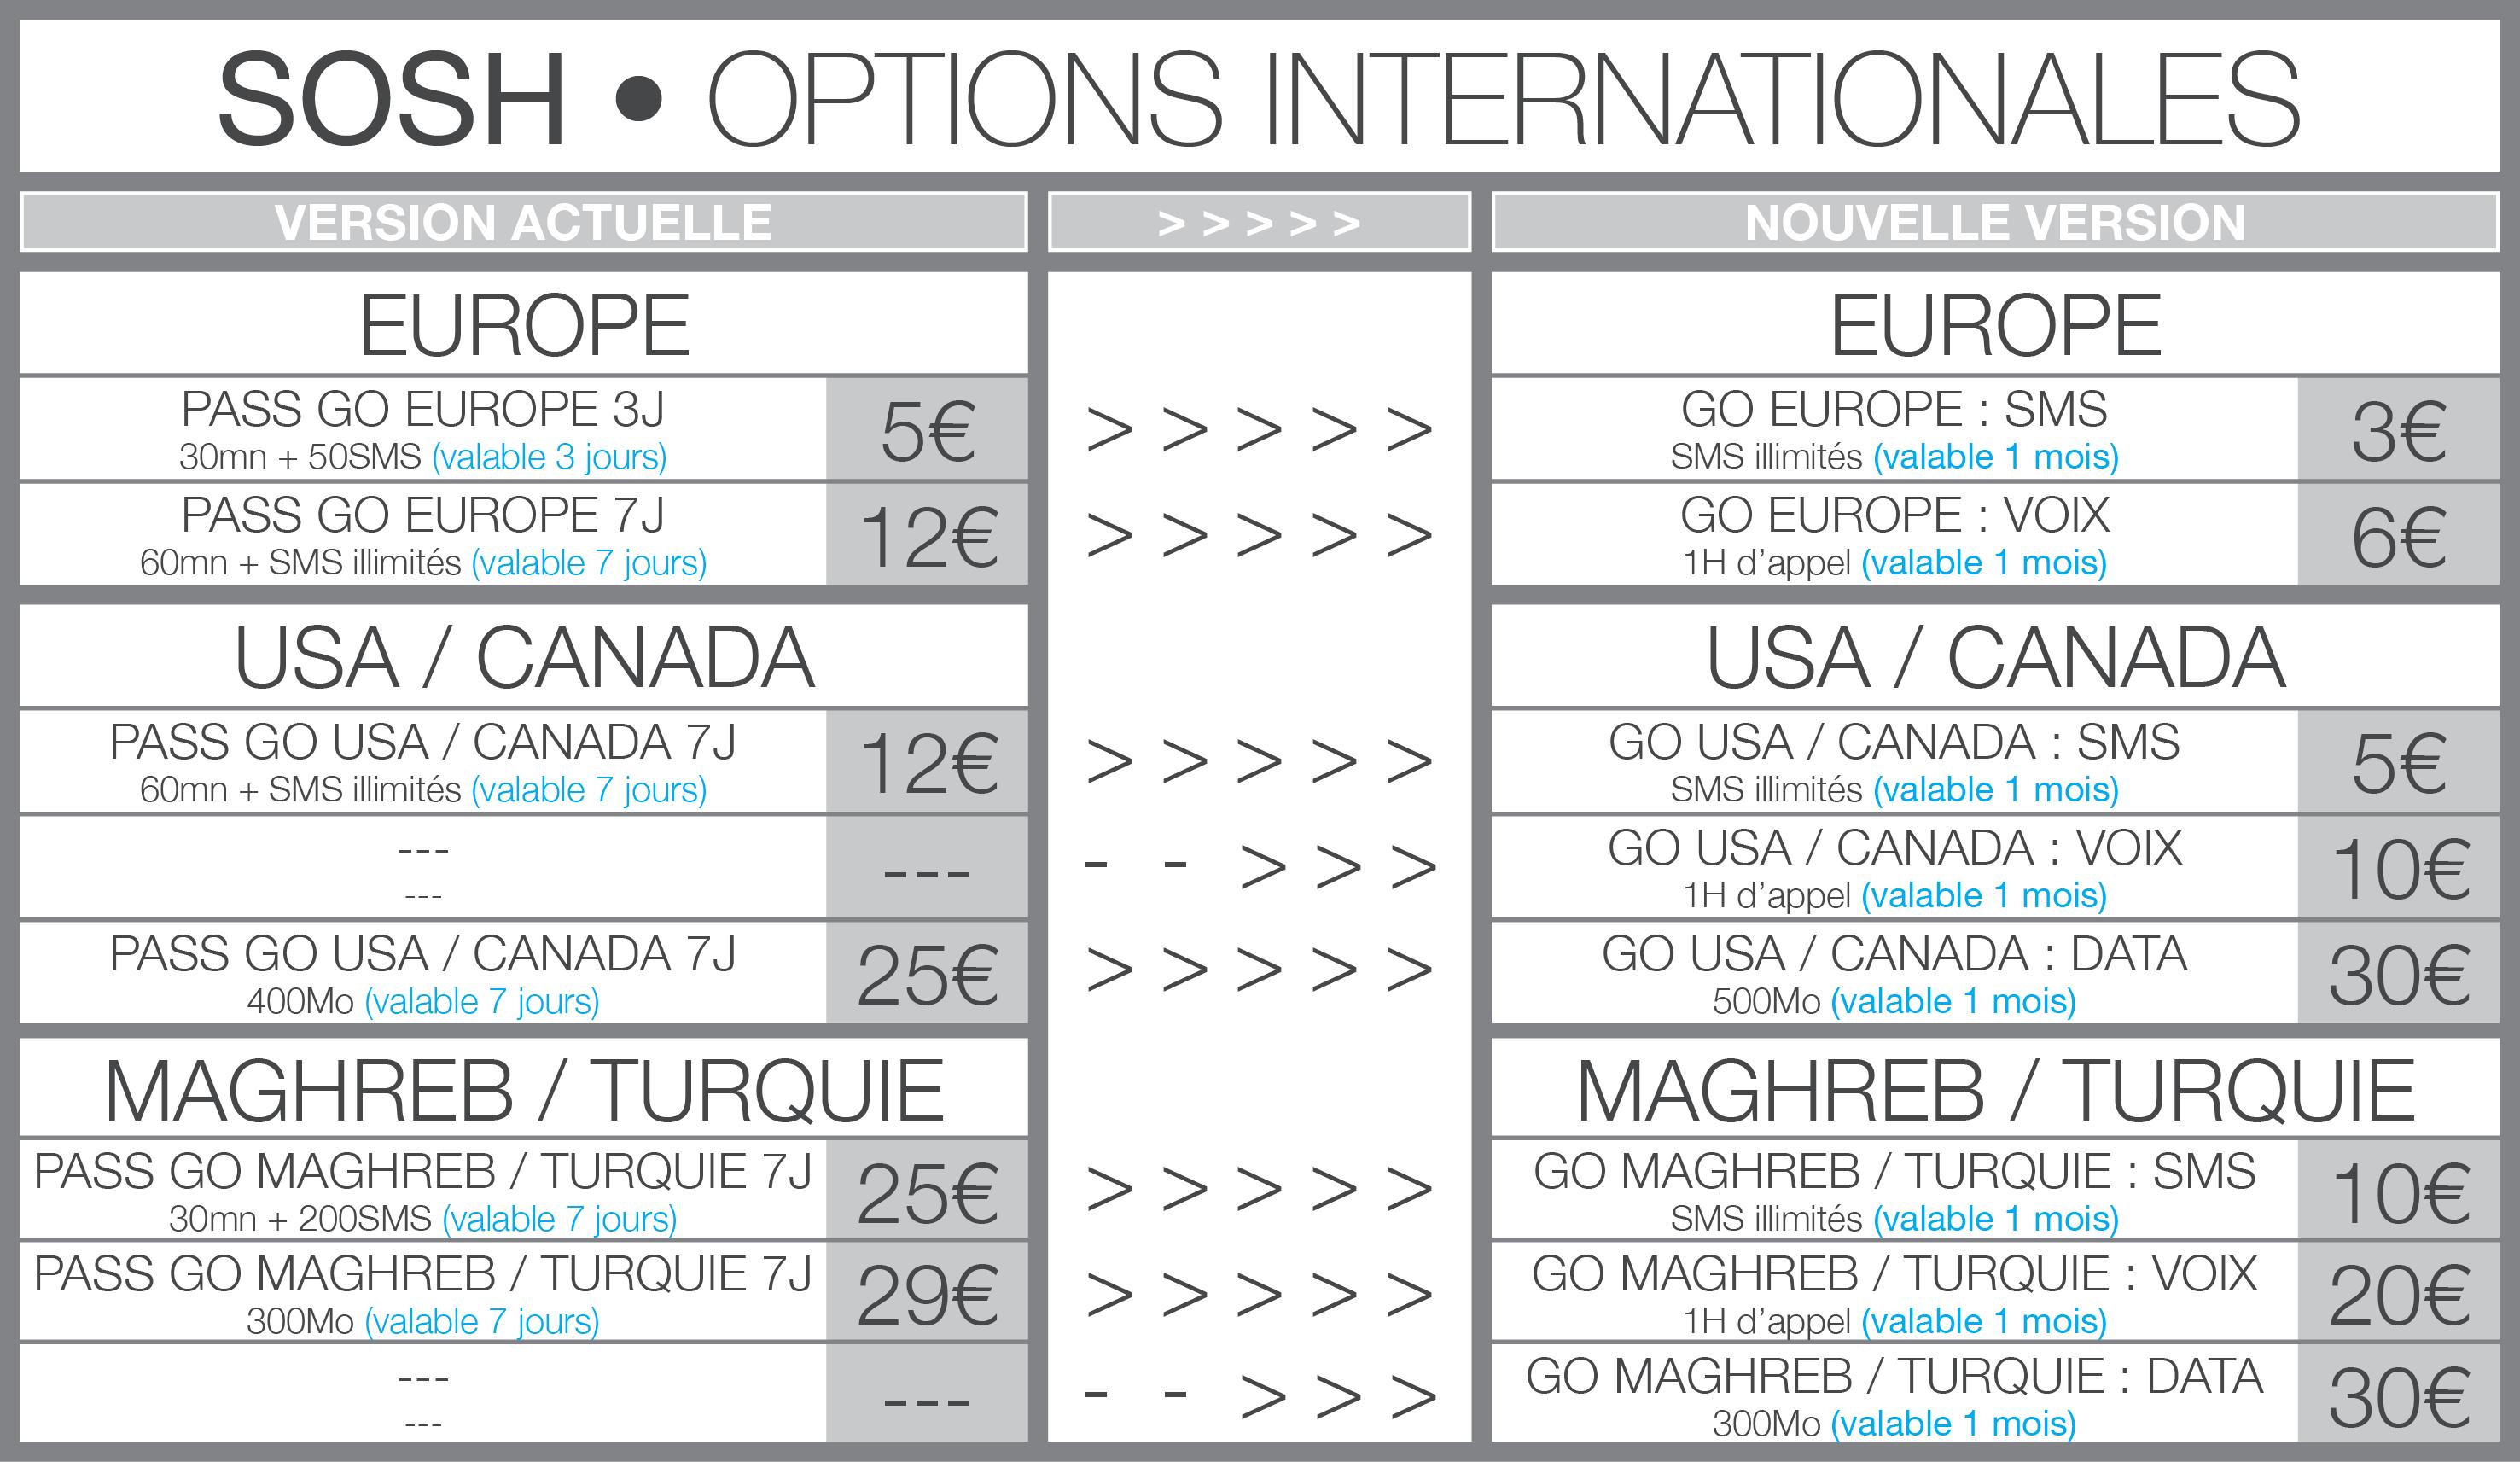 OPTIONS INTERNATIONALES SOSH.png